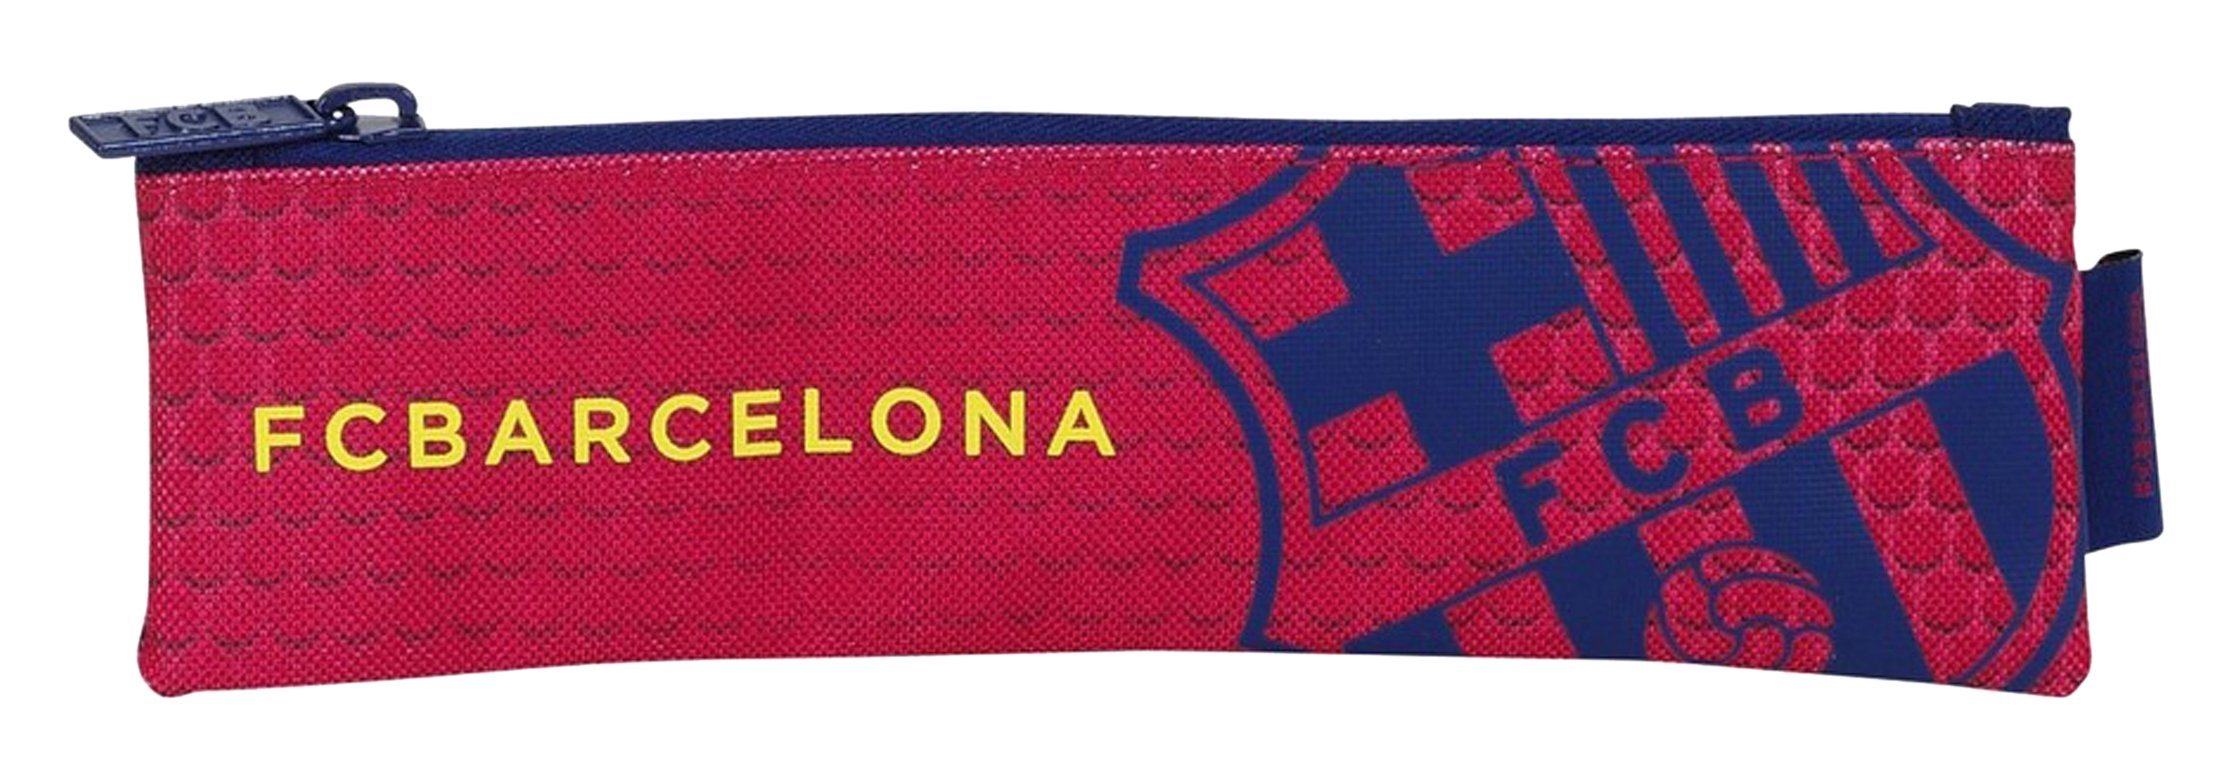 Futbol Club Barcelona – Estuche portatodo estrecho (Safta 811572025)